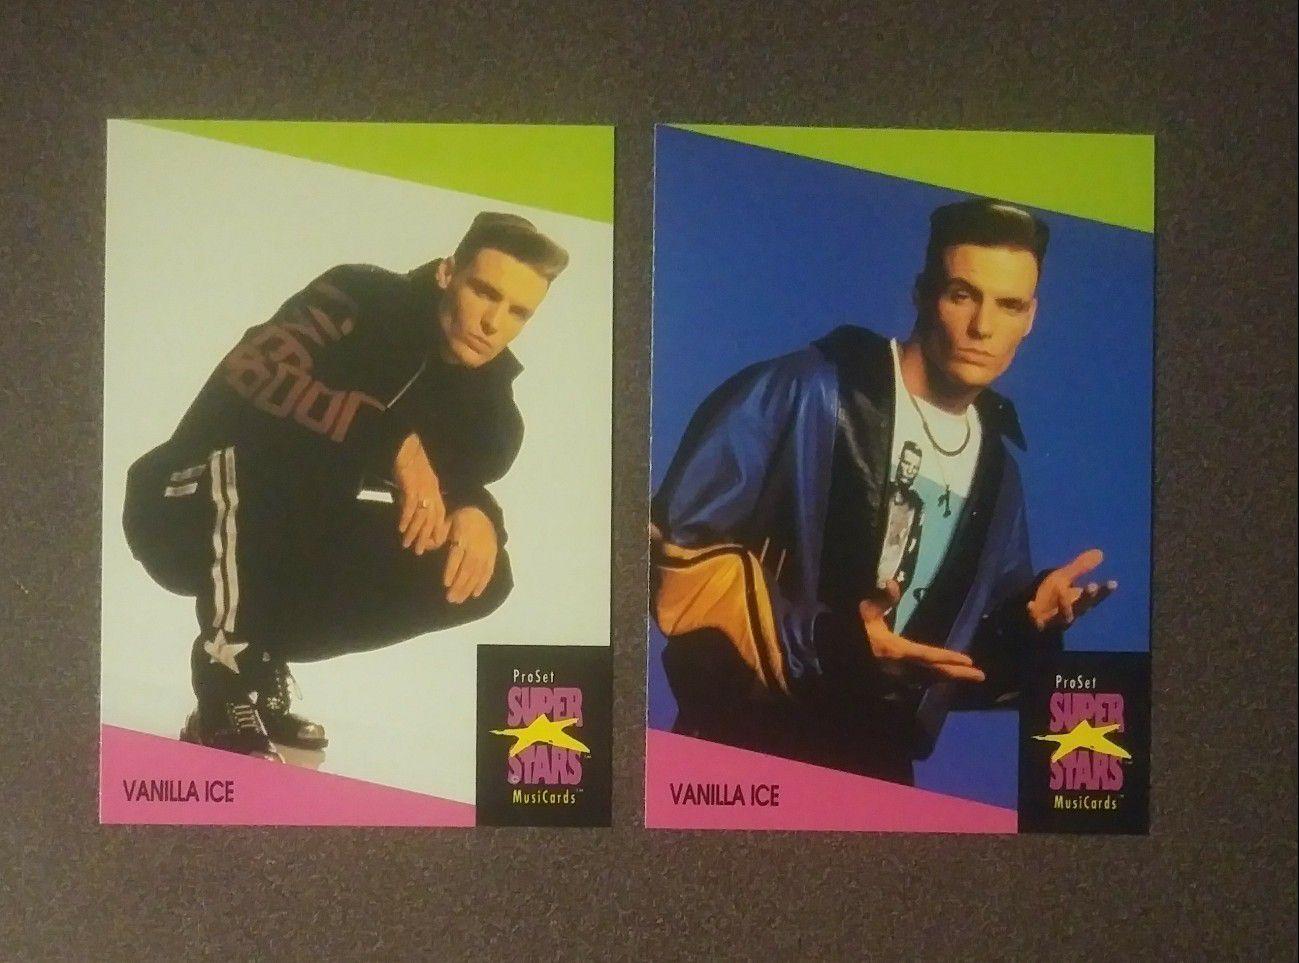 1991 ProSet Vanilla Ice #145 #146 Card Cards Lot Music Rap Artist Express Musicards Superstars Vintage Collectible Pro Set